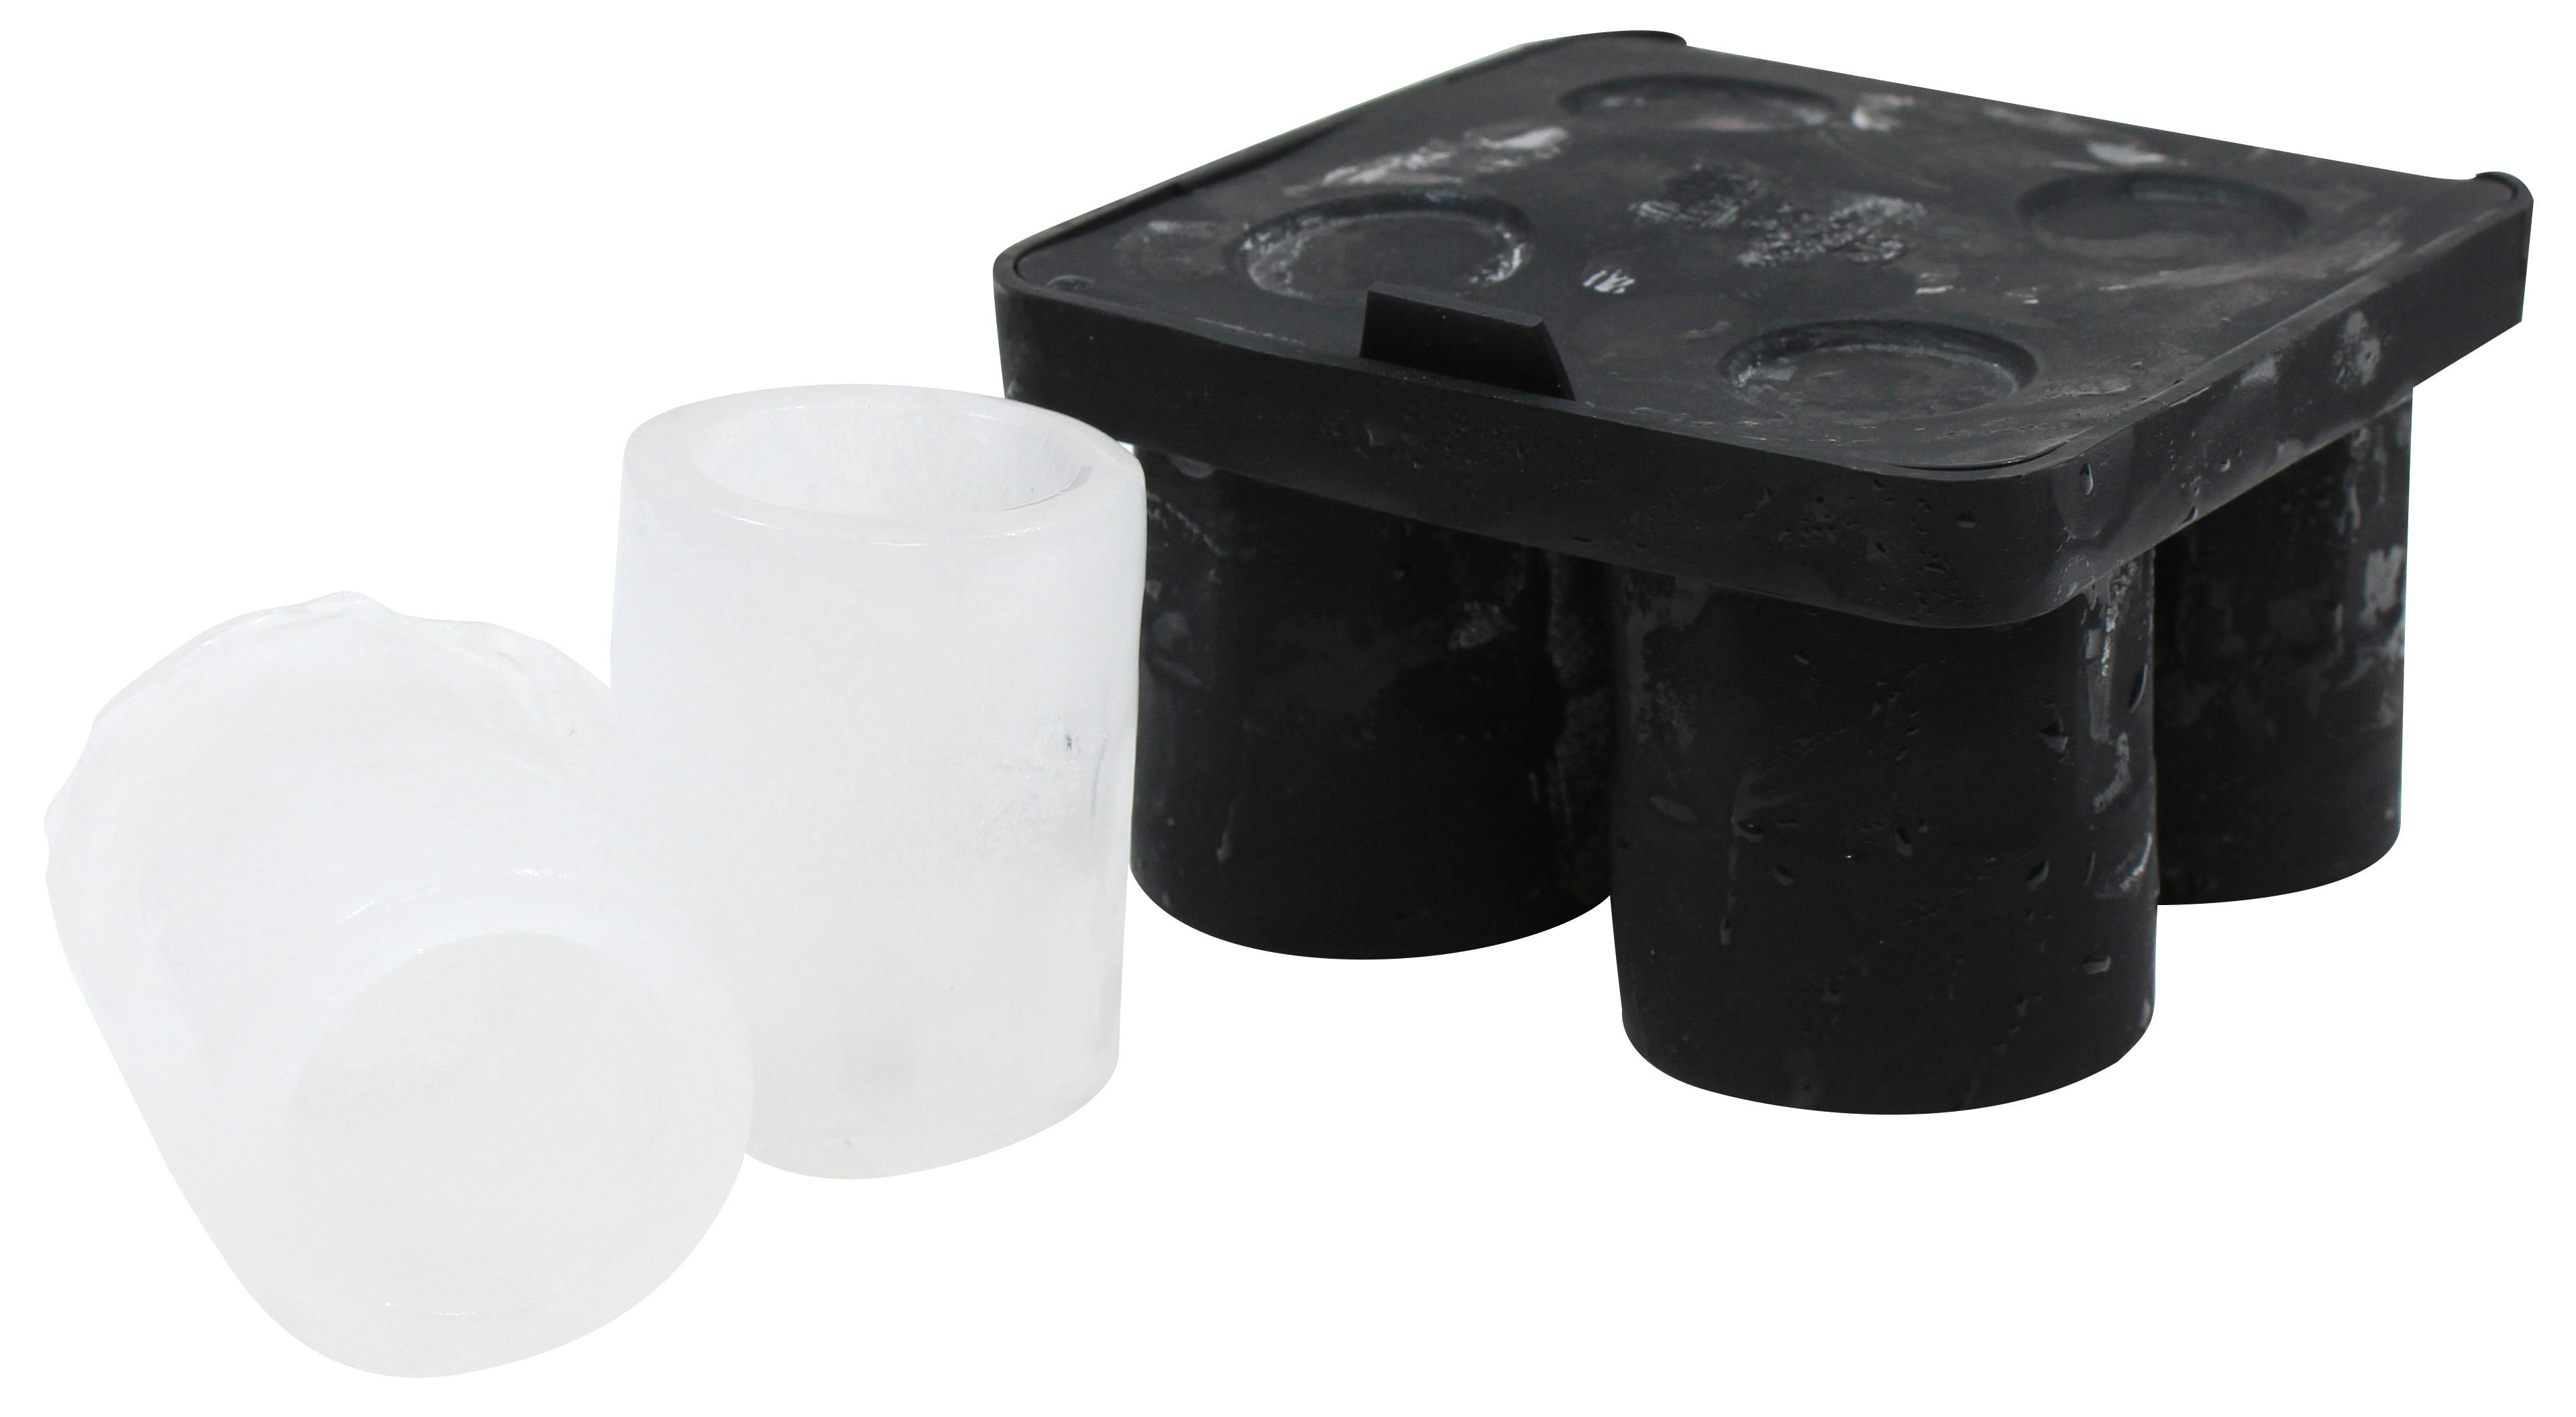 Hoshizaki B-500PF ice bin for ice machines